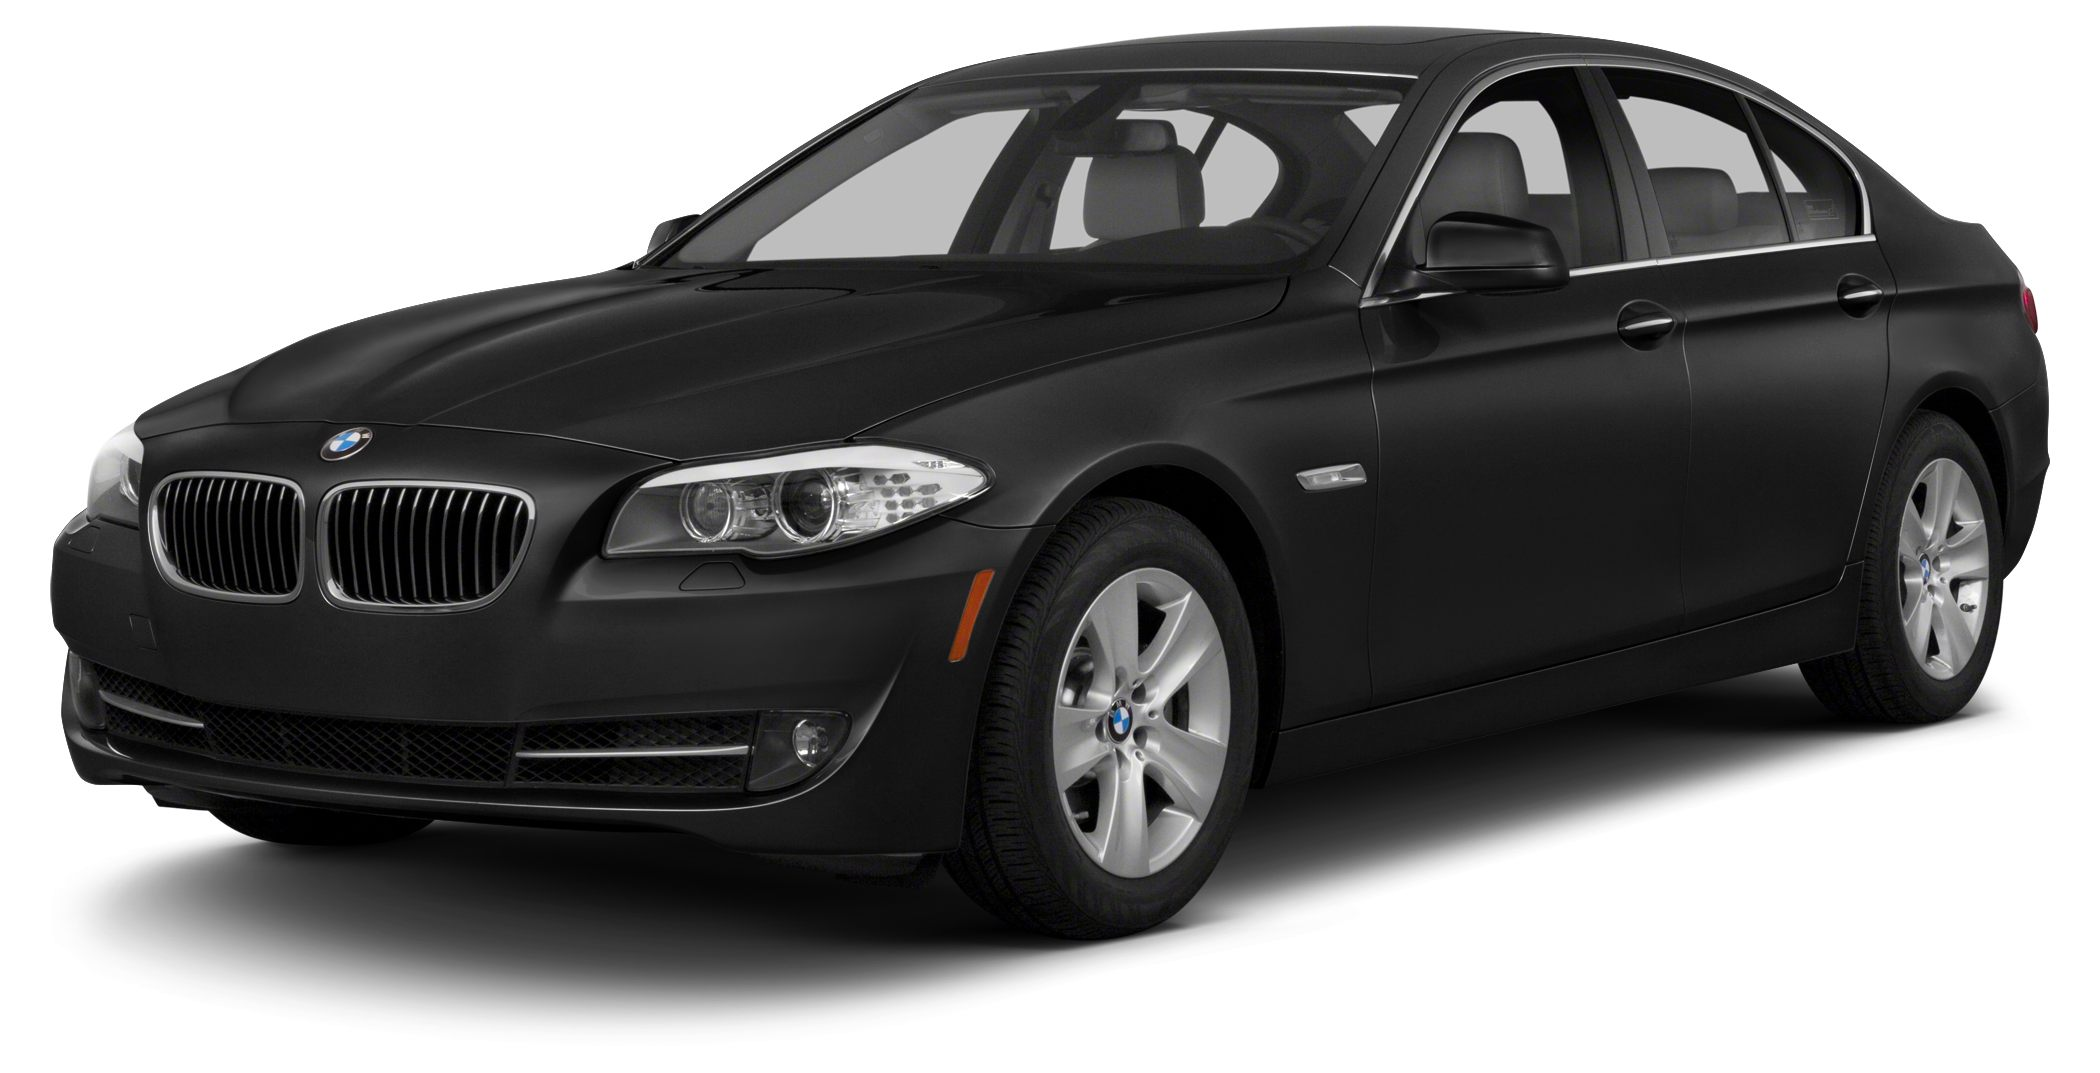 2013 BMW 5 Series 535i Miles 62608Color Dark Gray Stock 827331 VIN WBAFR7C51DC827331